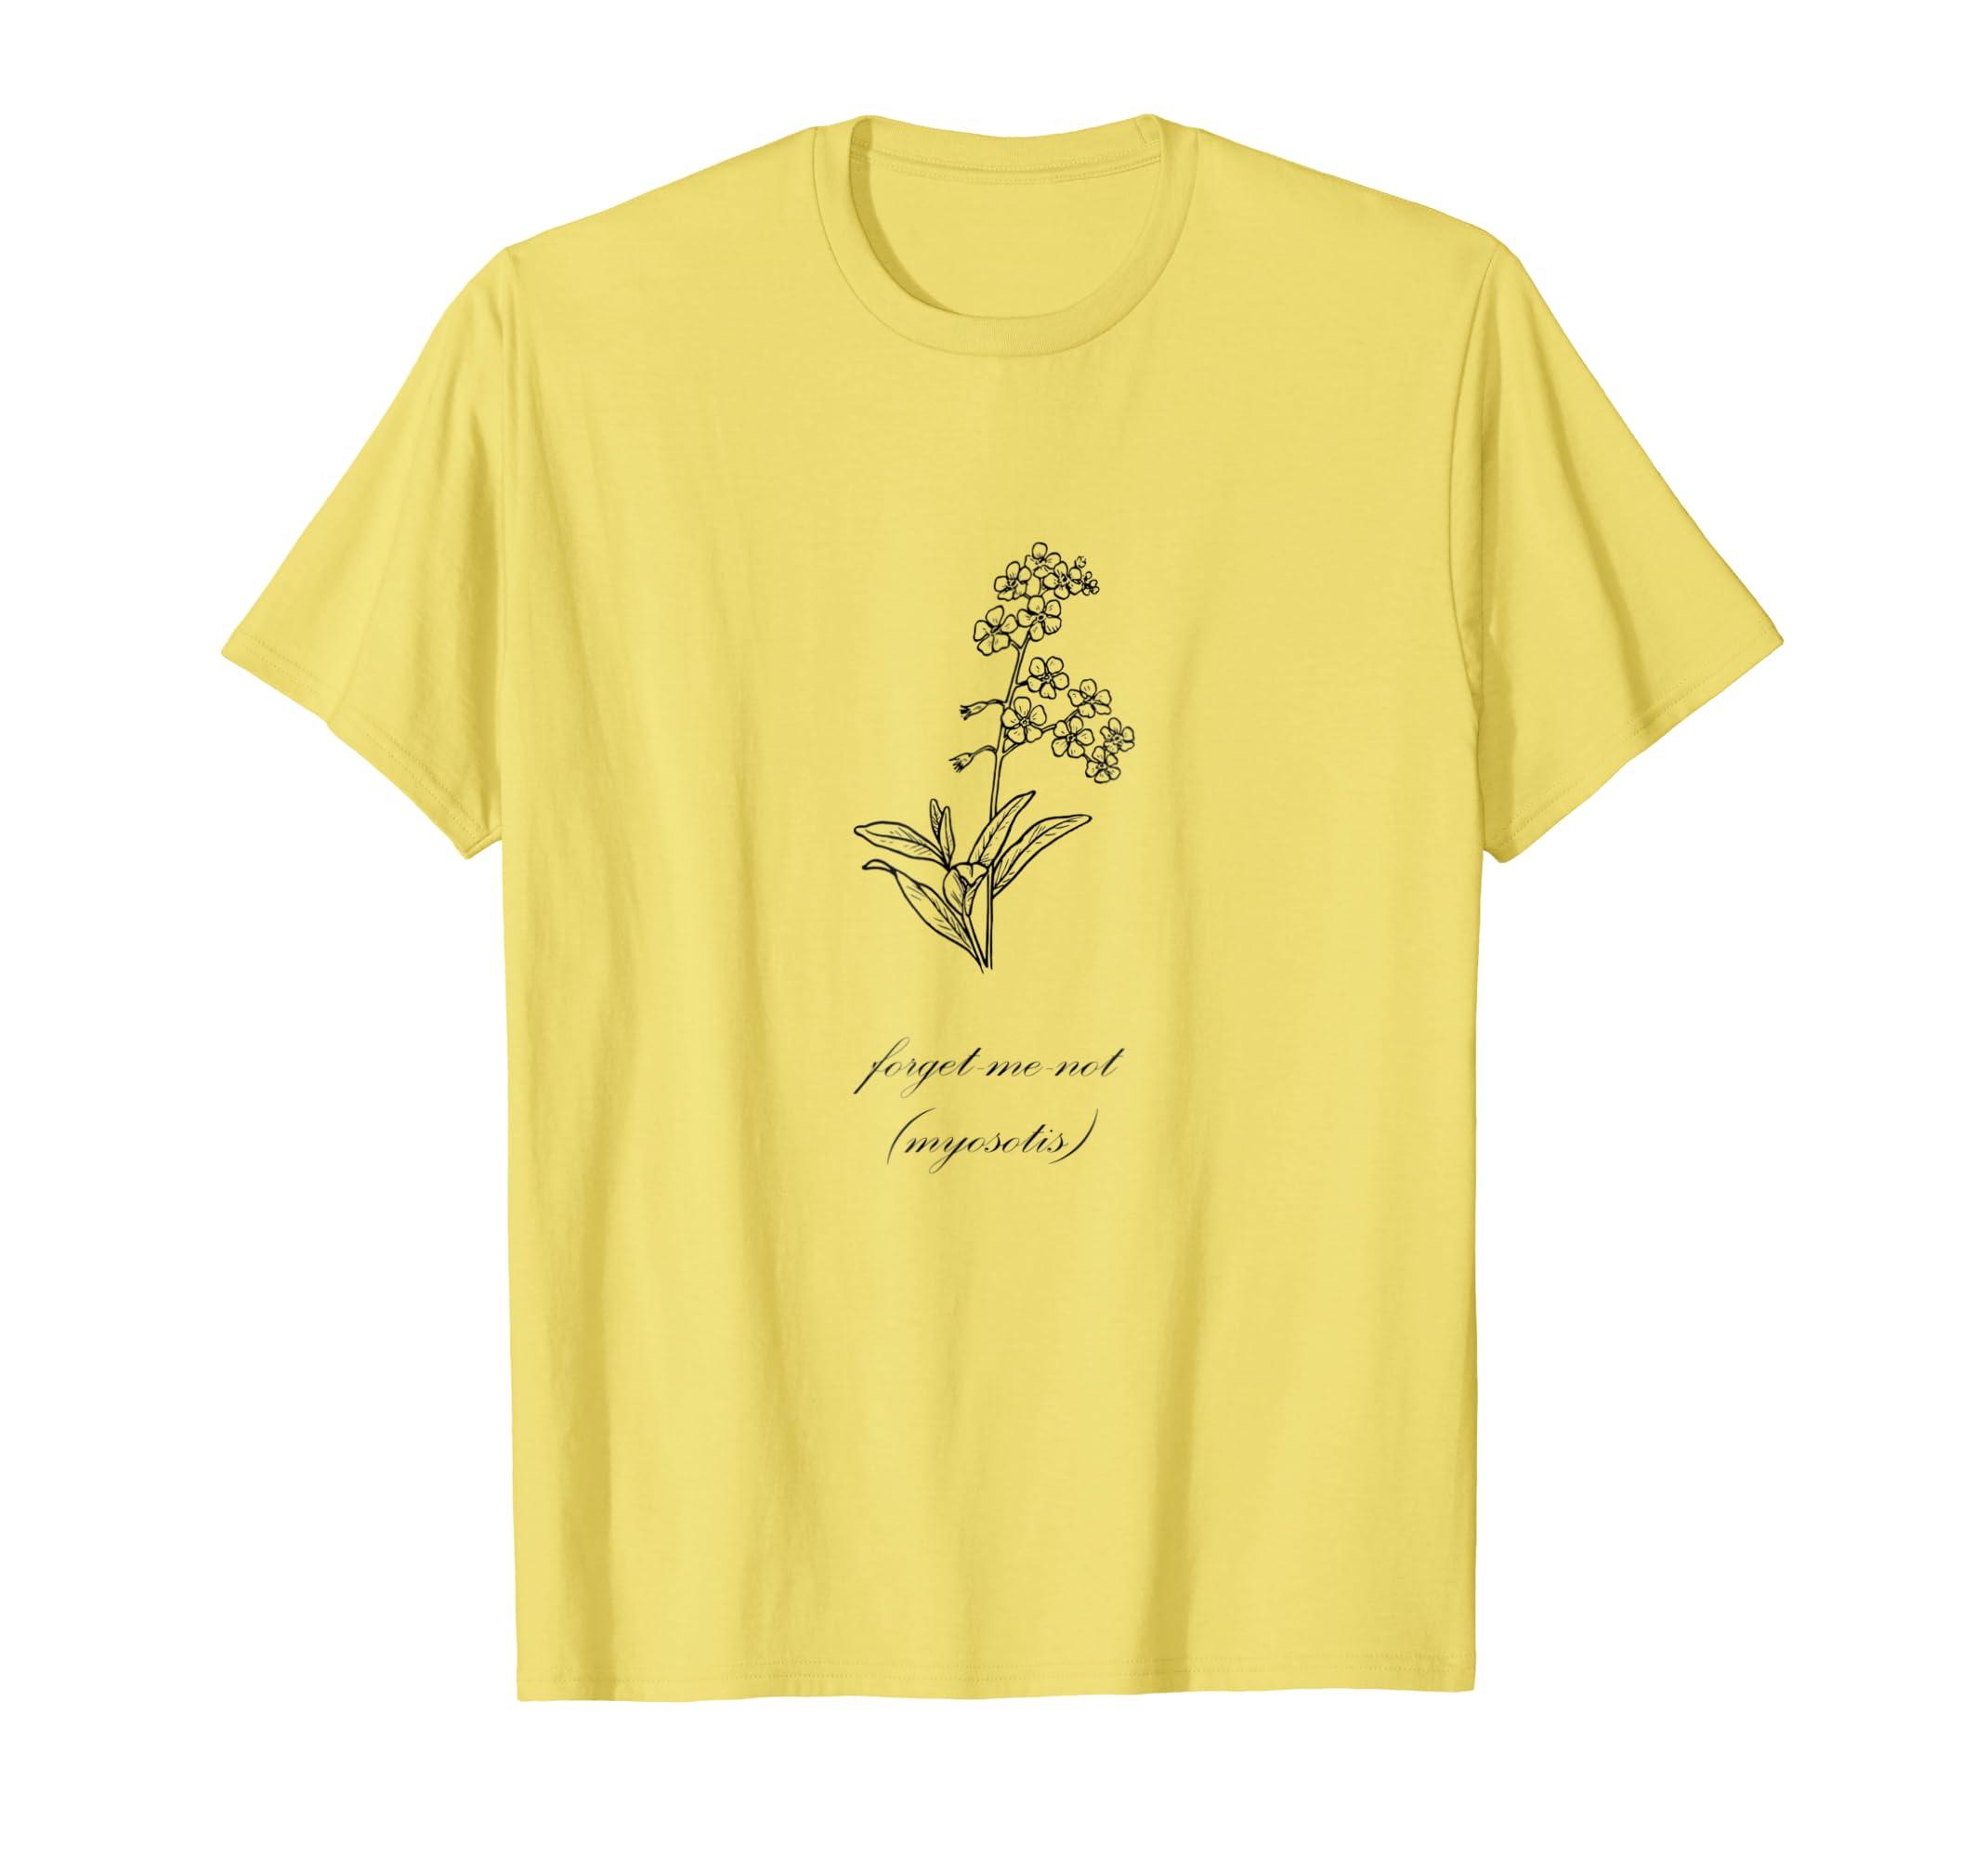 e29d6acfc93c Amazon.com: Forget Me Not Flower - Men Women Children T-Shirt: Clothing